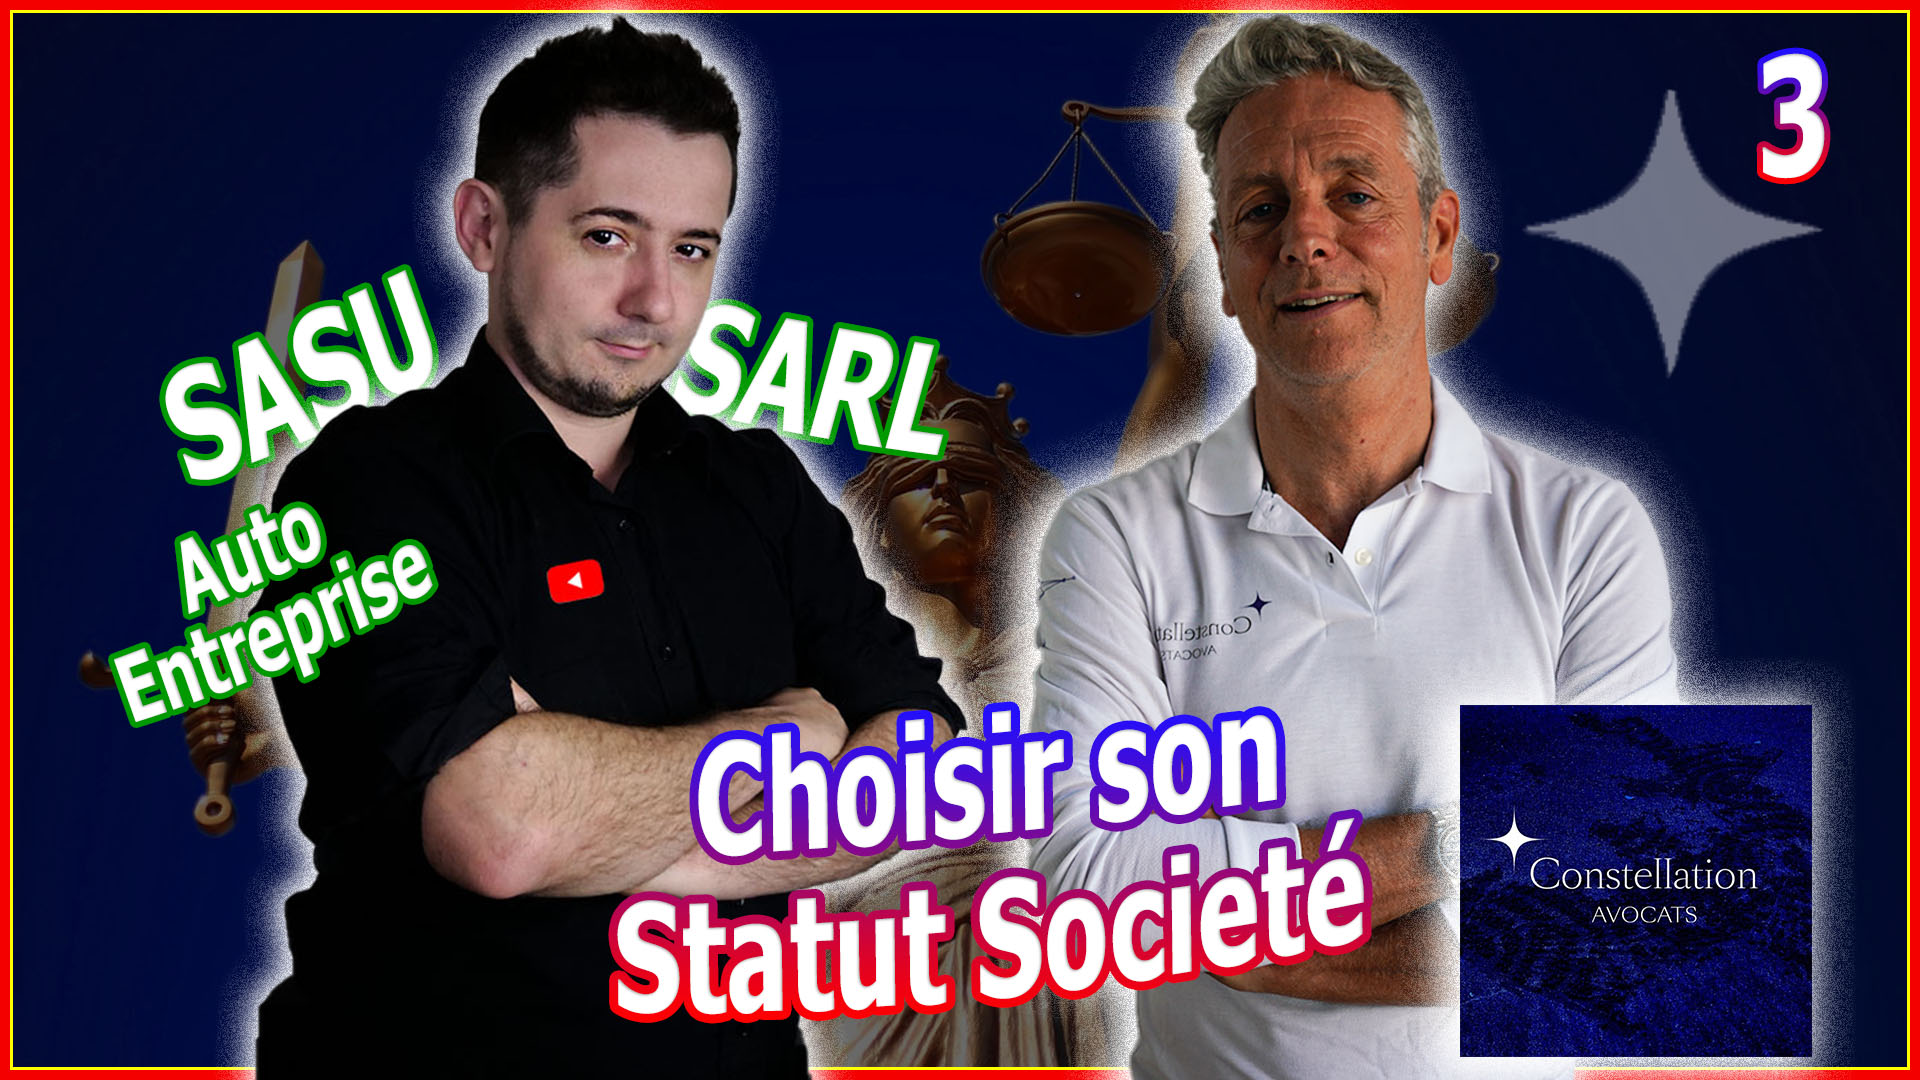 SAS ou SARL : Quel statut choisir après autoentrepreneur ?